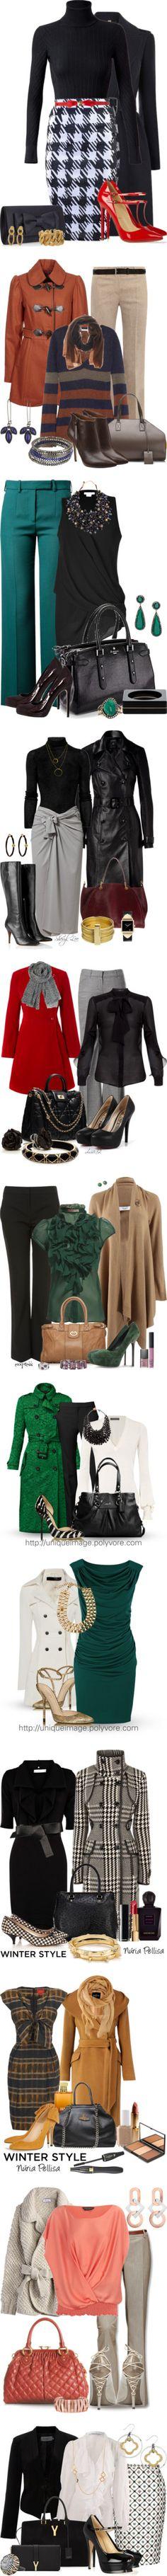 Business Dress 3 by cassandra-spann ❤ liked on Polyvore